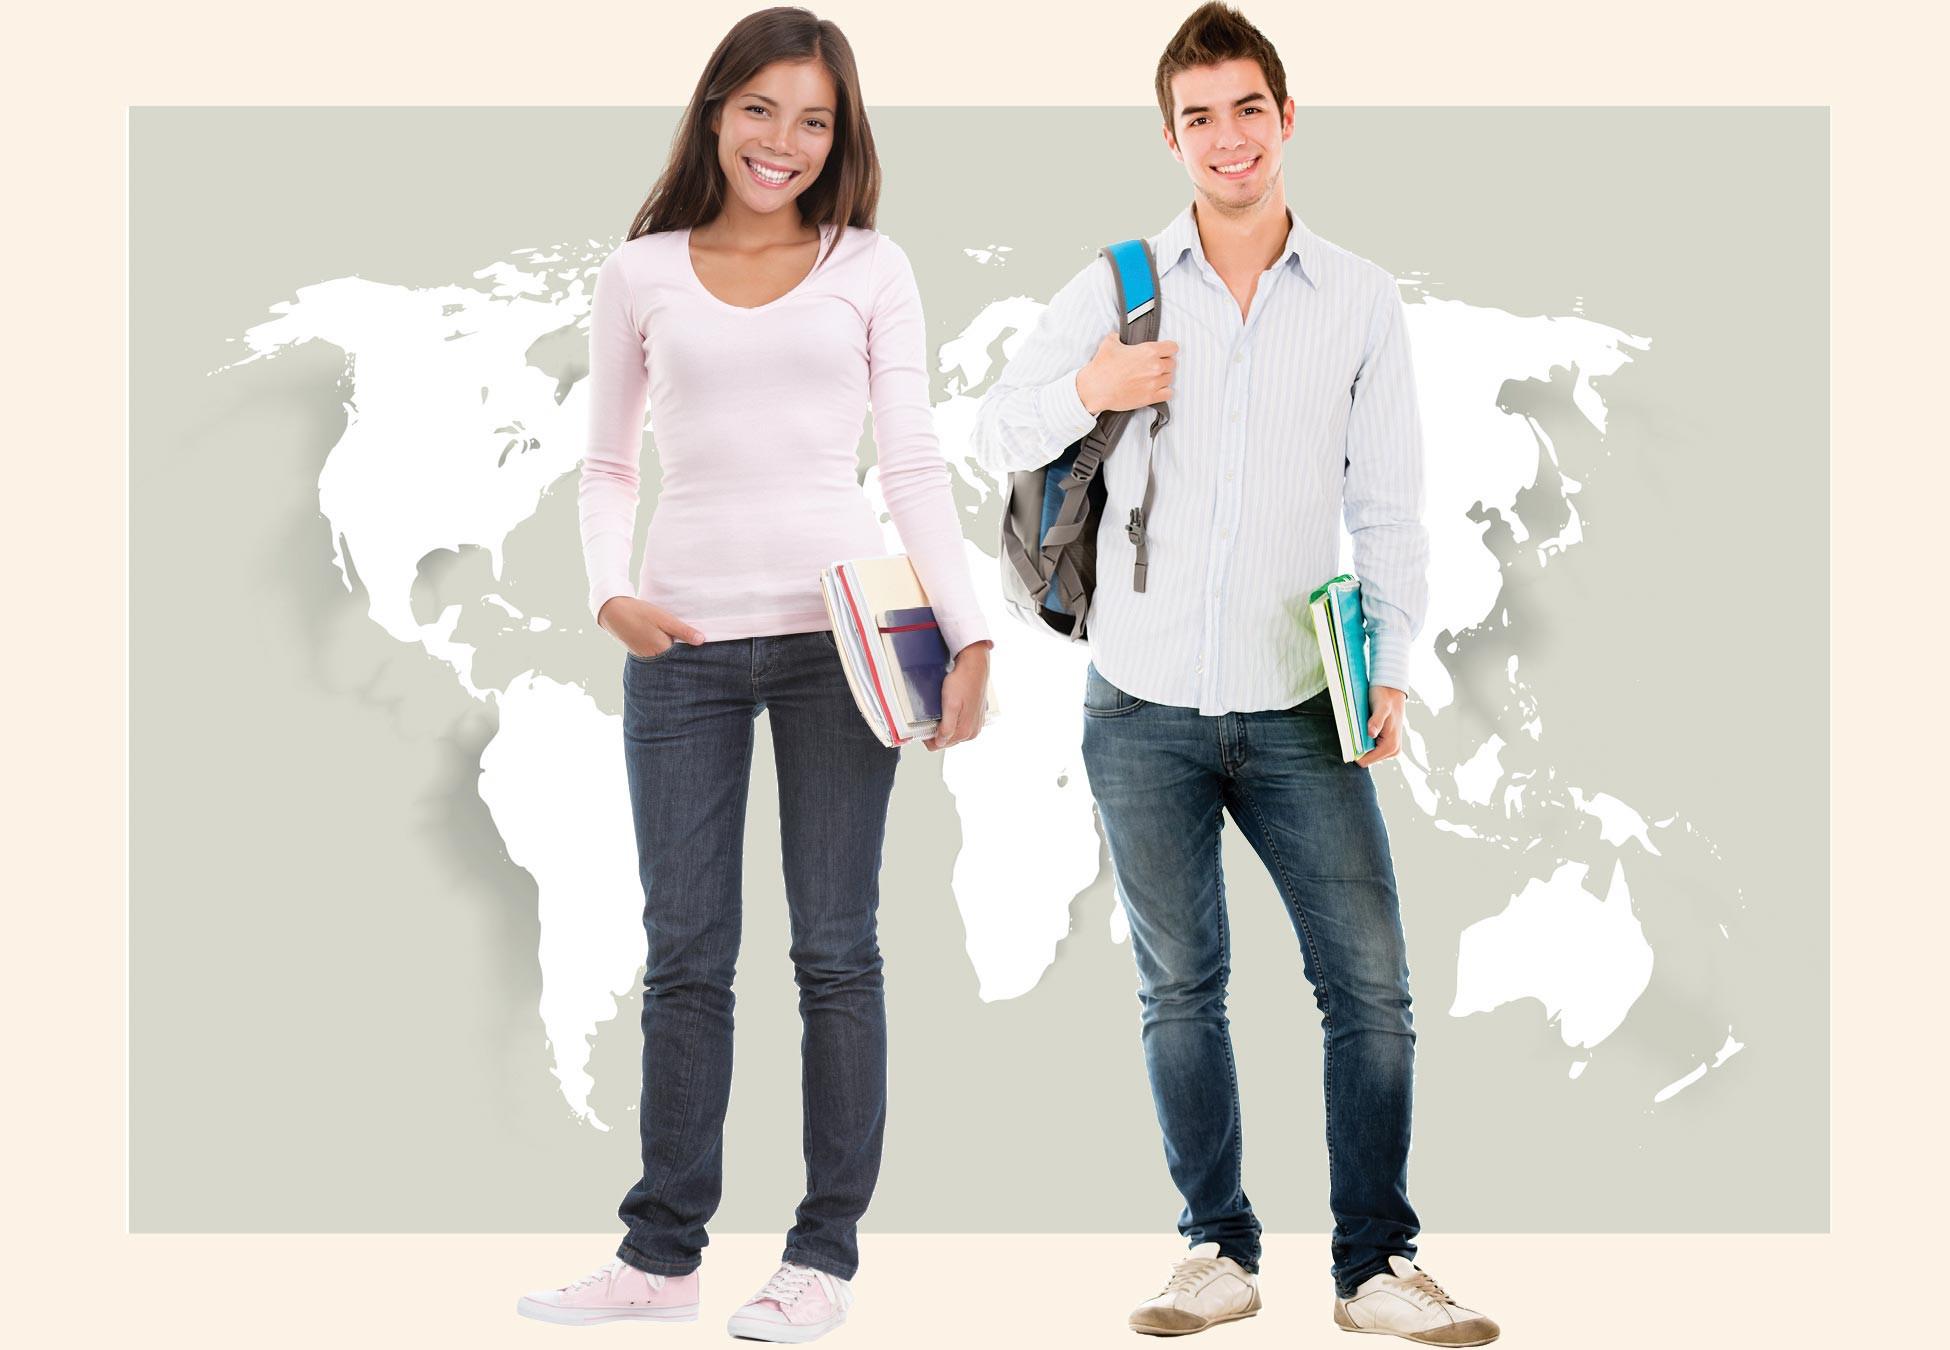 Logistics/Travel Assistance